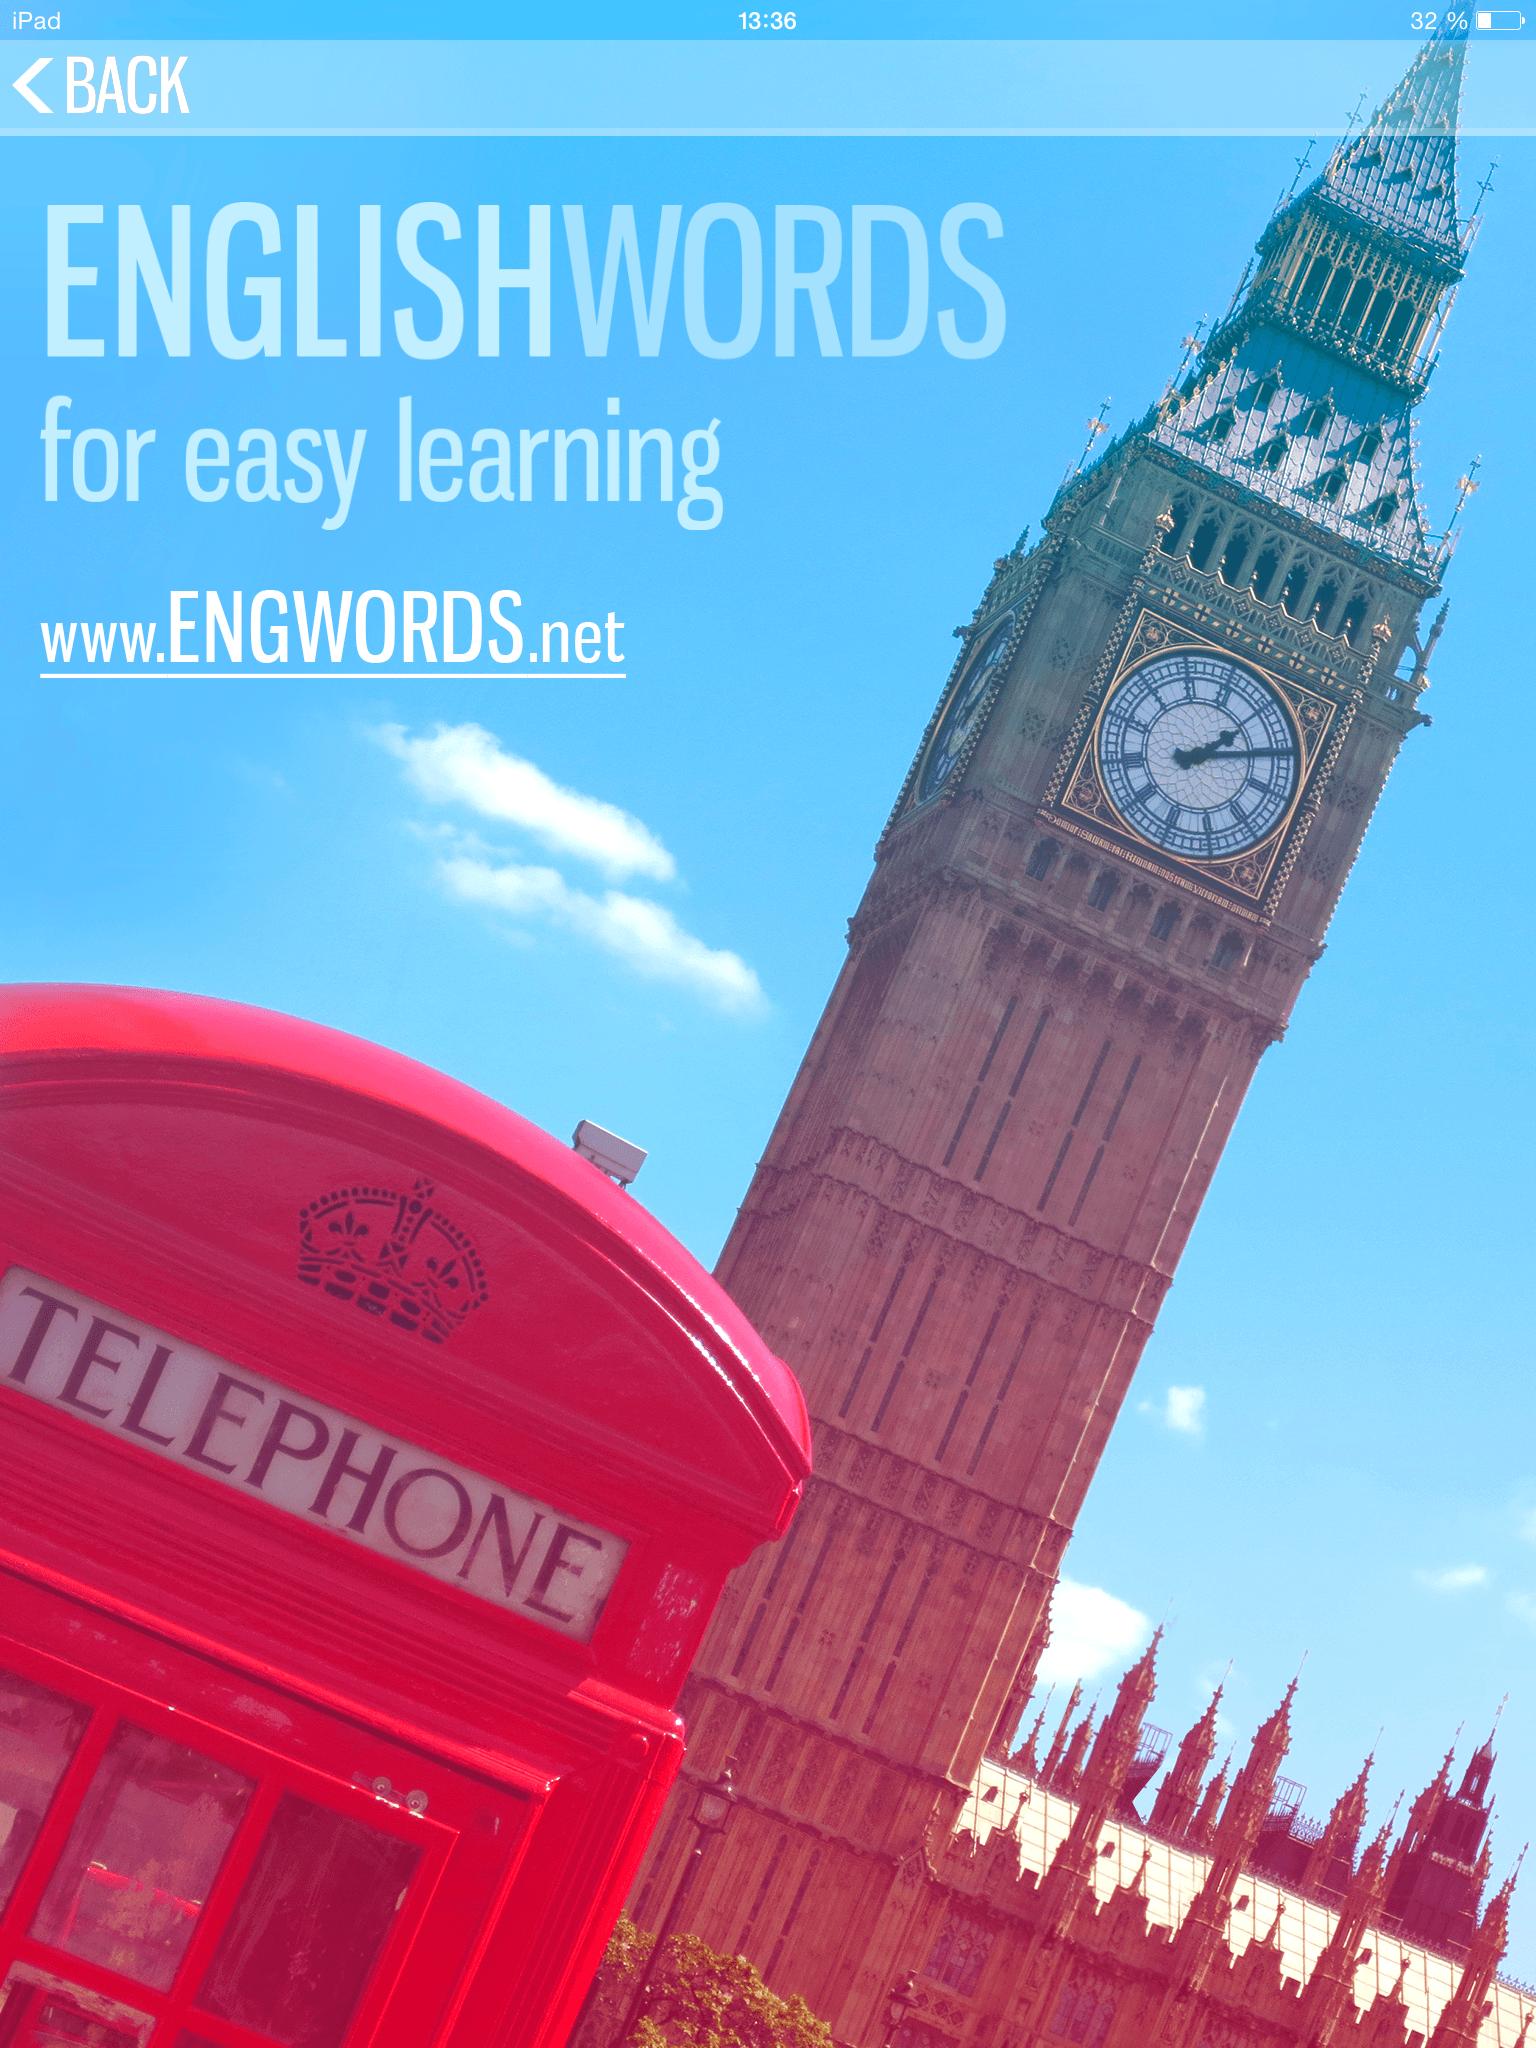 Приложение 3500 English Words доступно на iOS